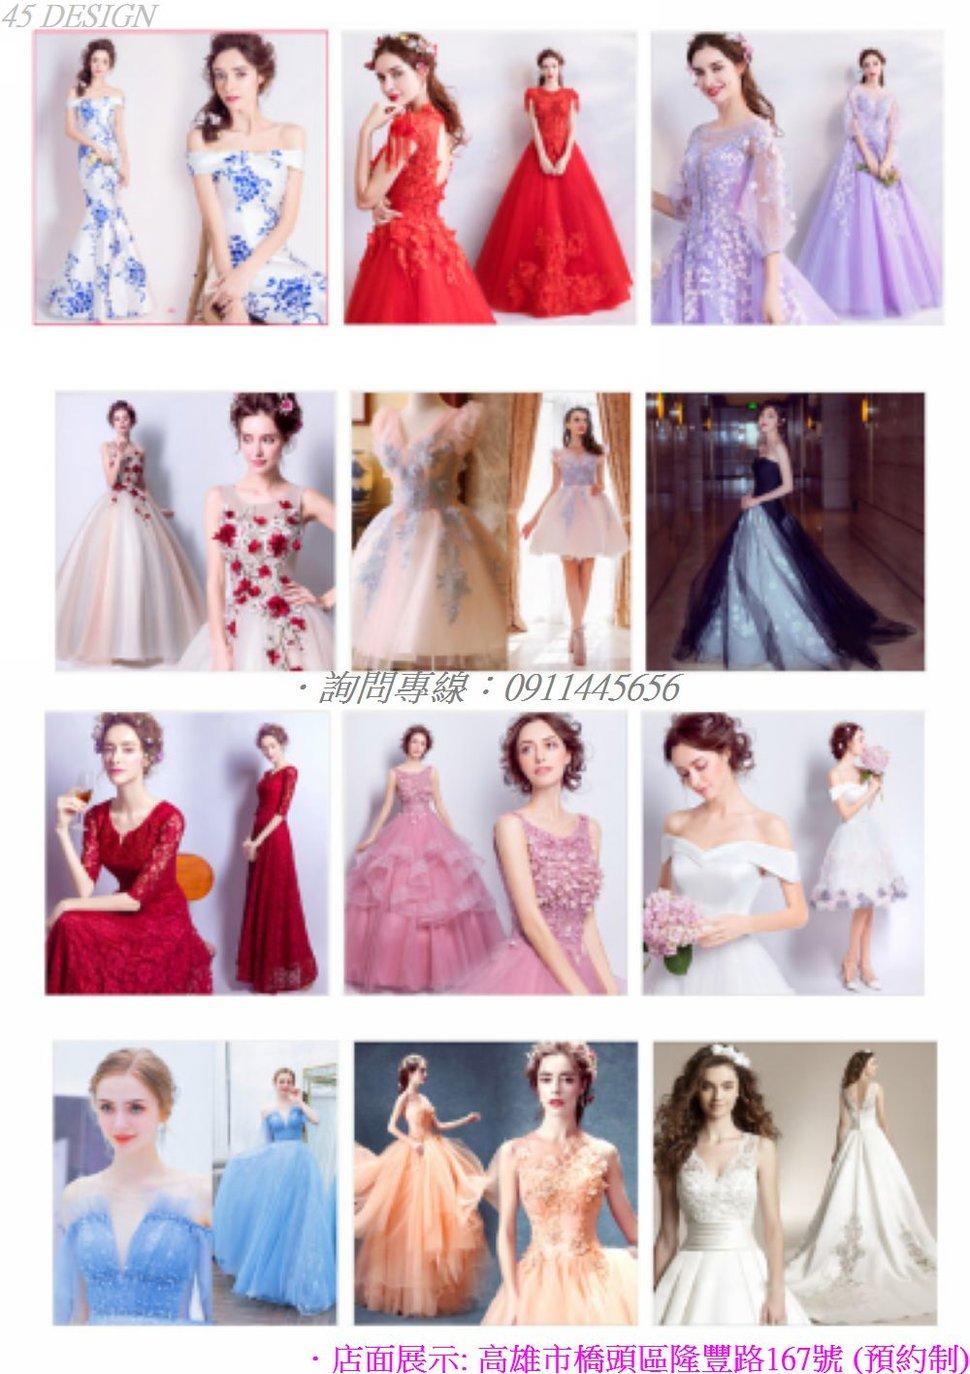 msl190815FF9ACD47149B4E9C8AEB8114286DE7CE - 全台最便宜-45DESIGN四五婚紗禮服《結婚吧》